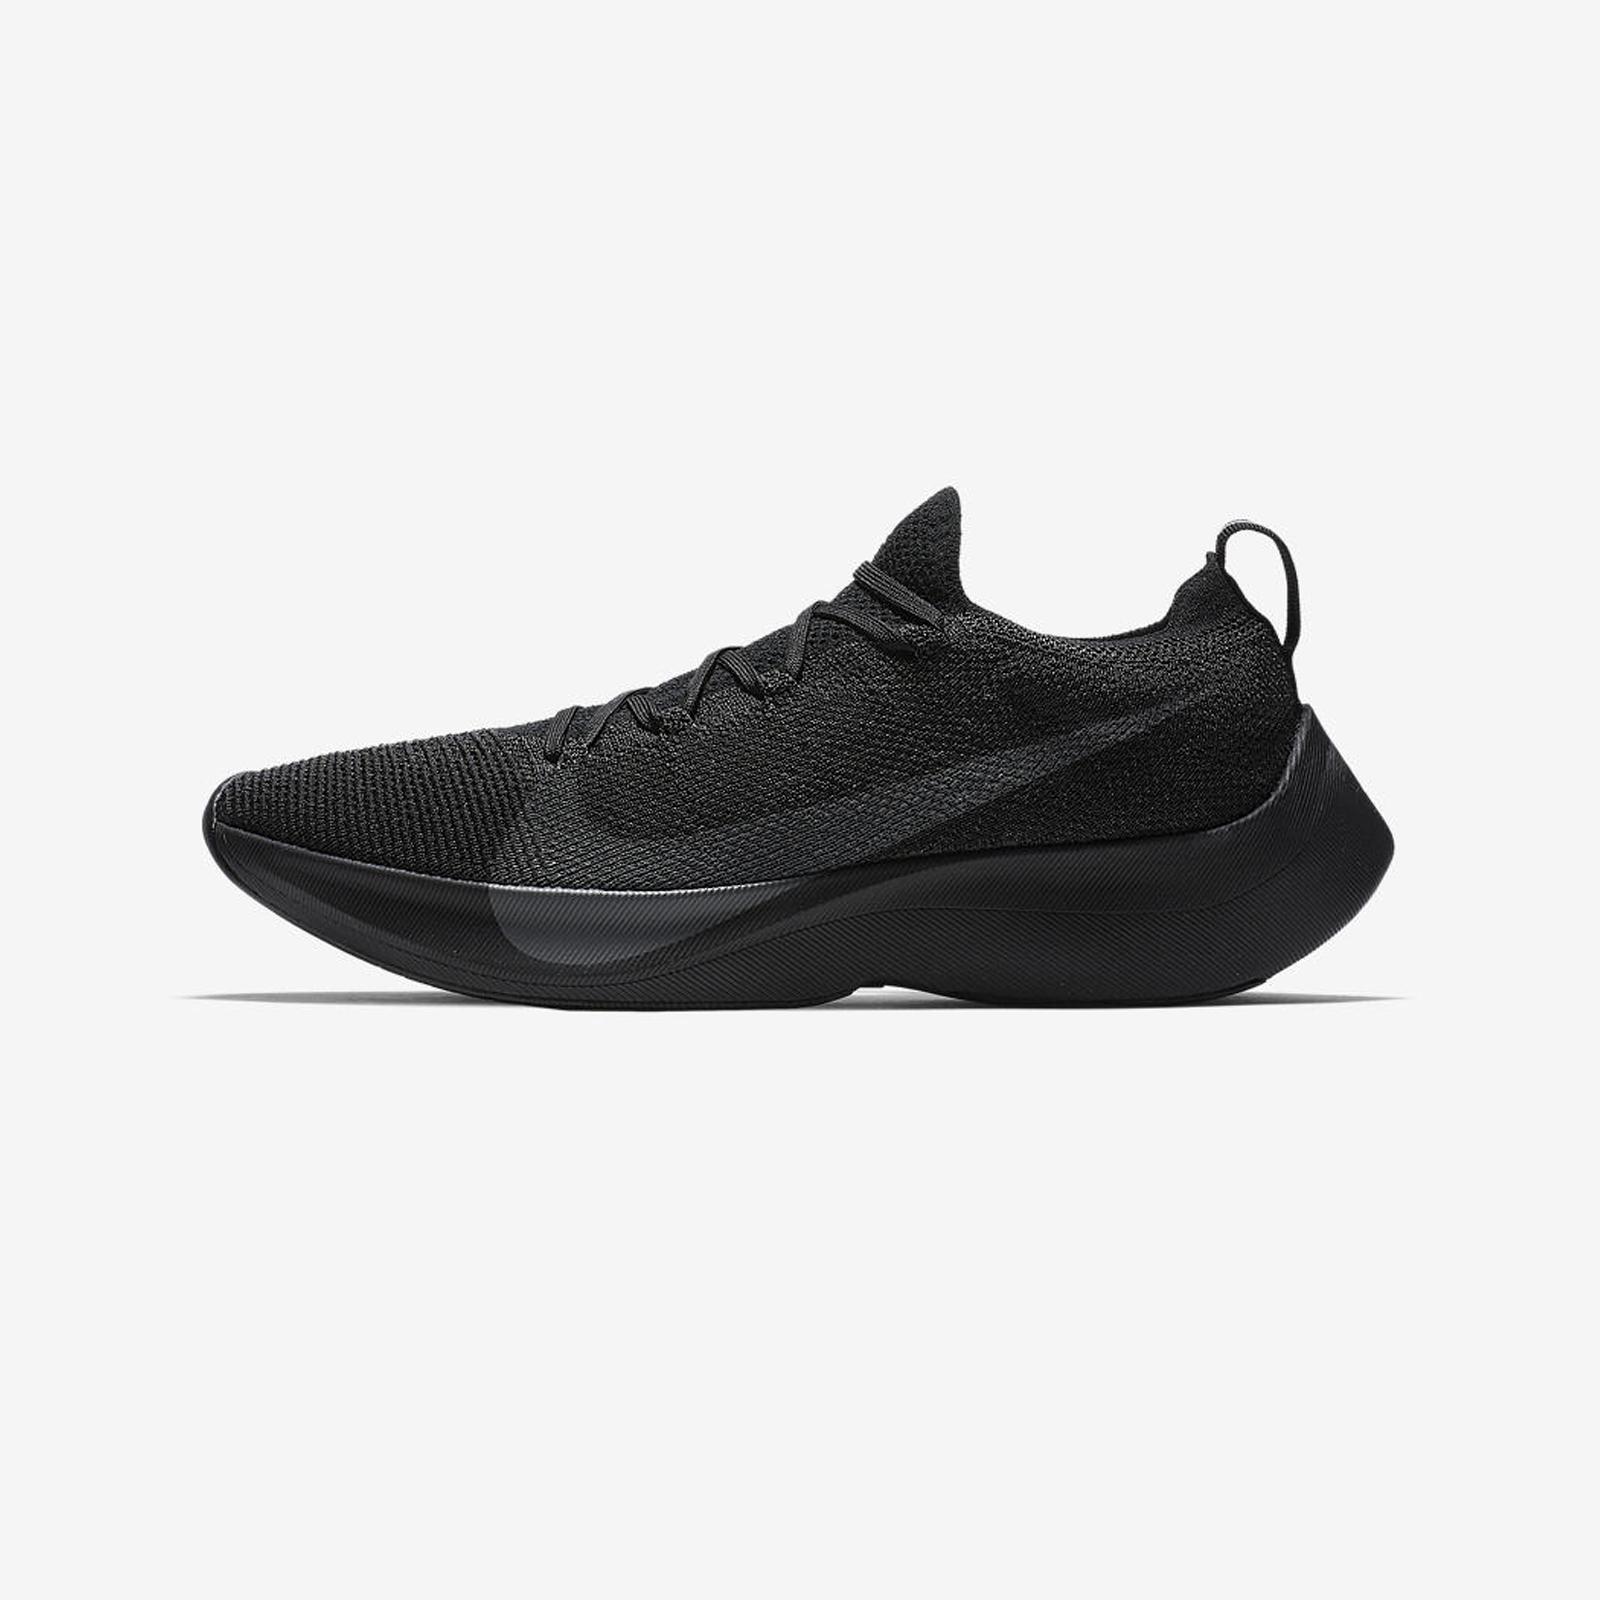 64d19a74db34 Nike Vapor Street Flyknit - Aq1763-001 - Sneakersnstuff